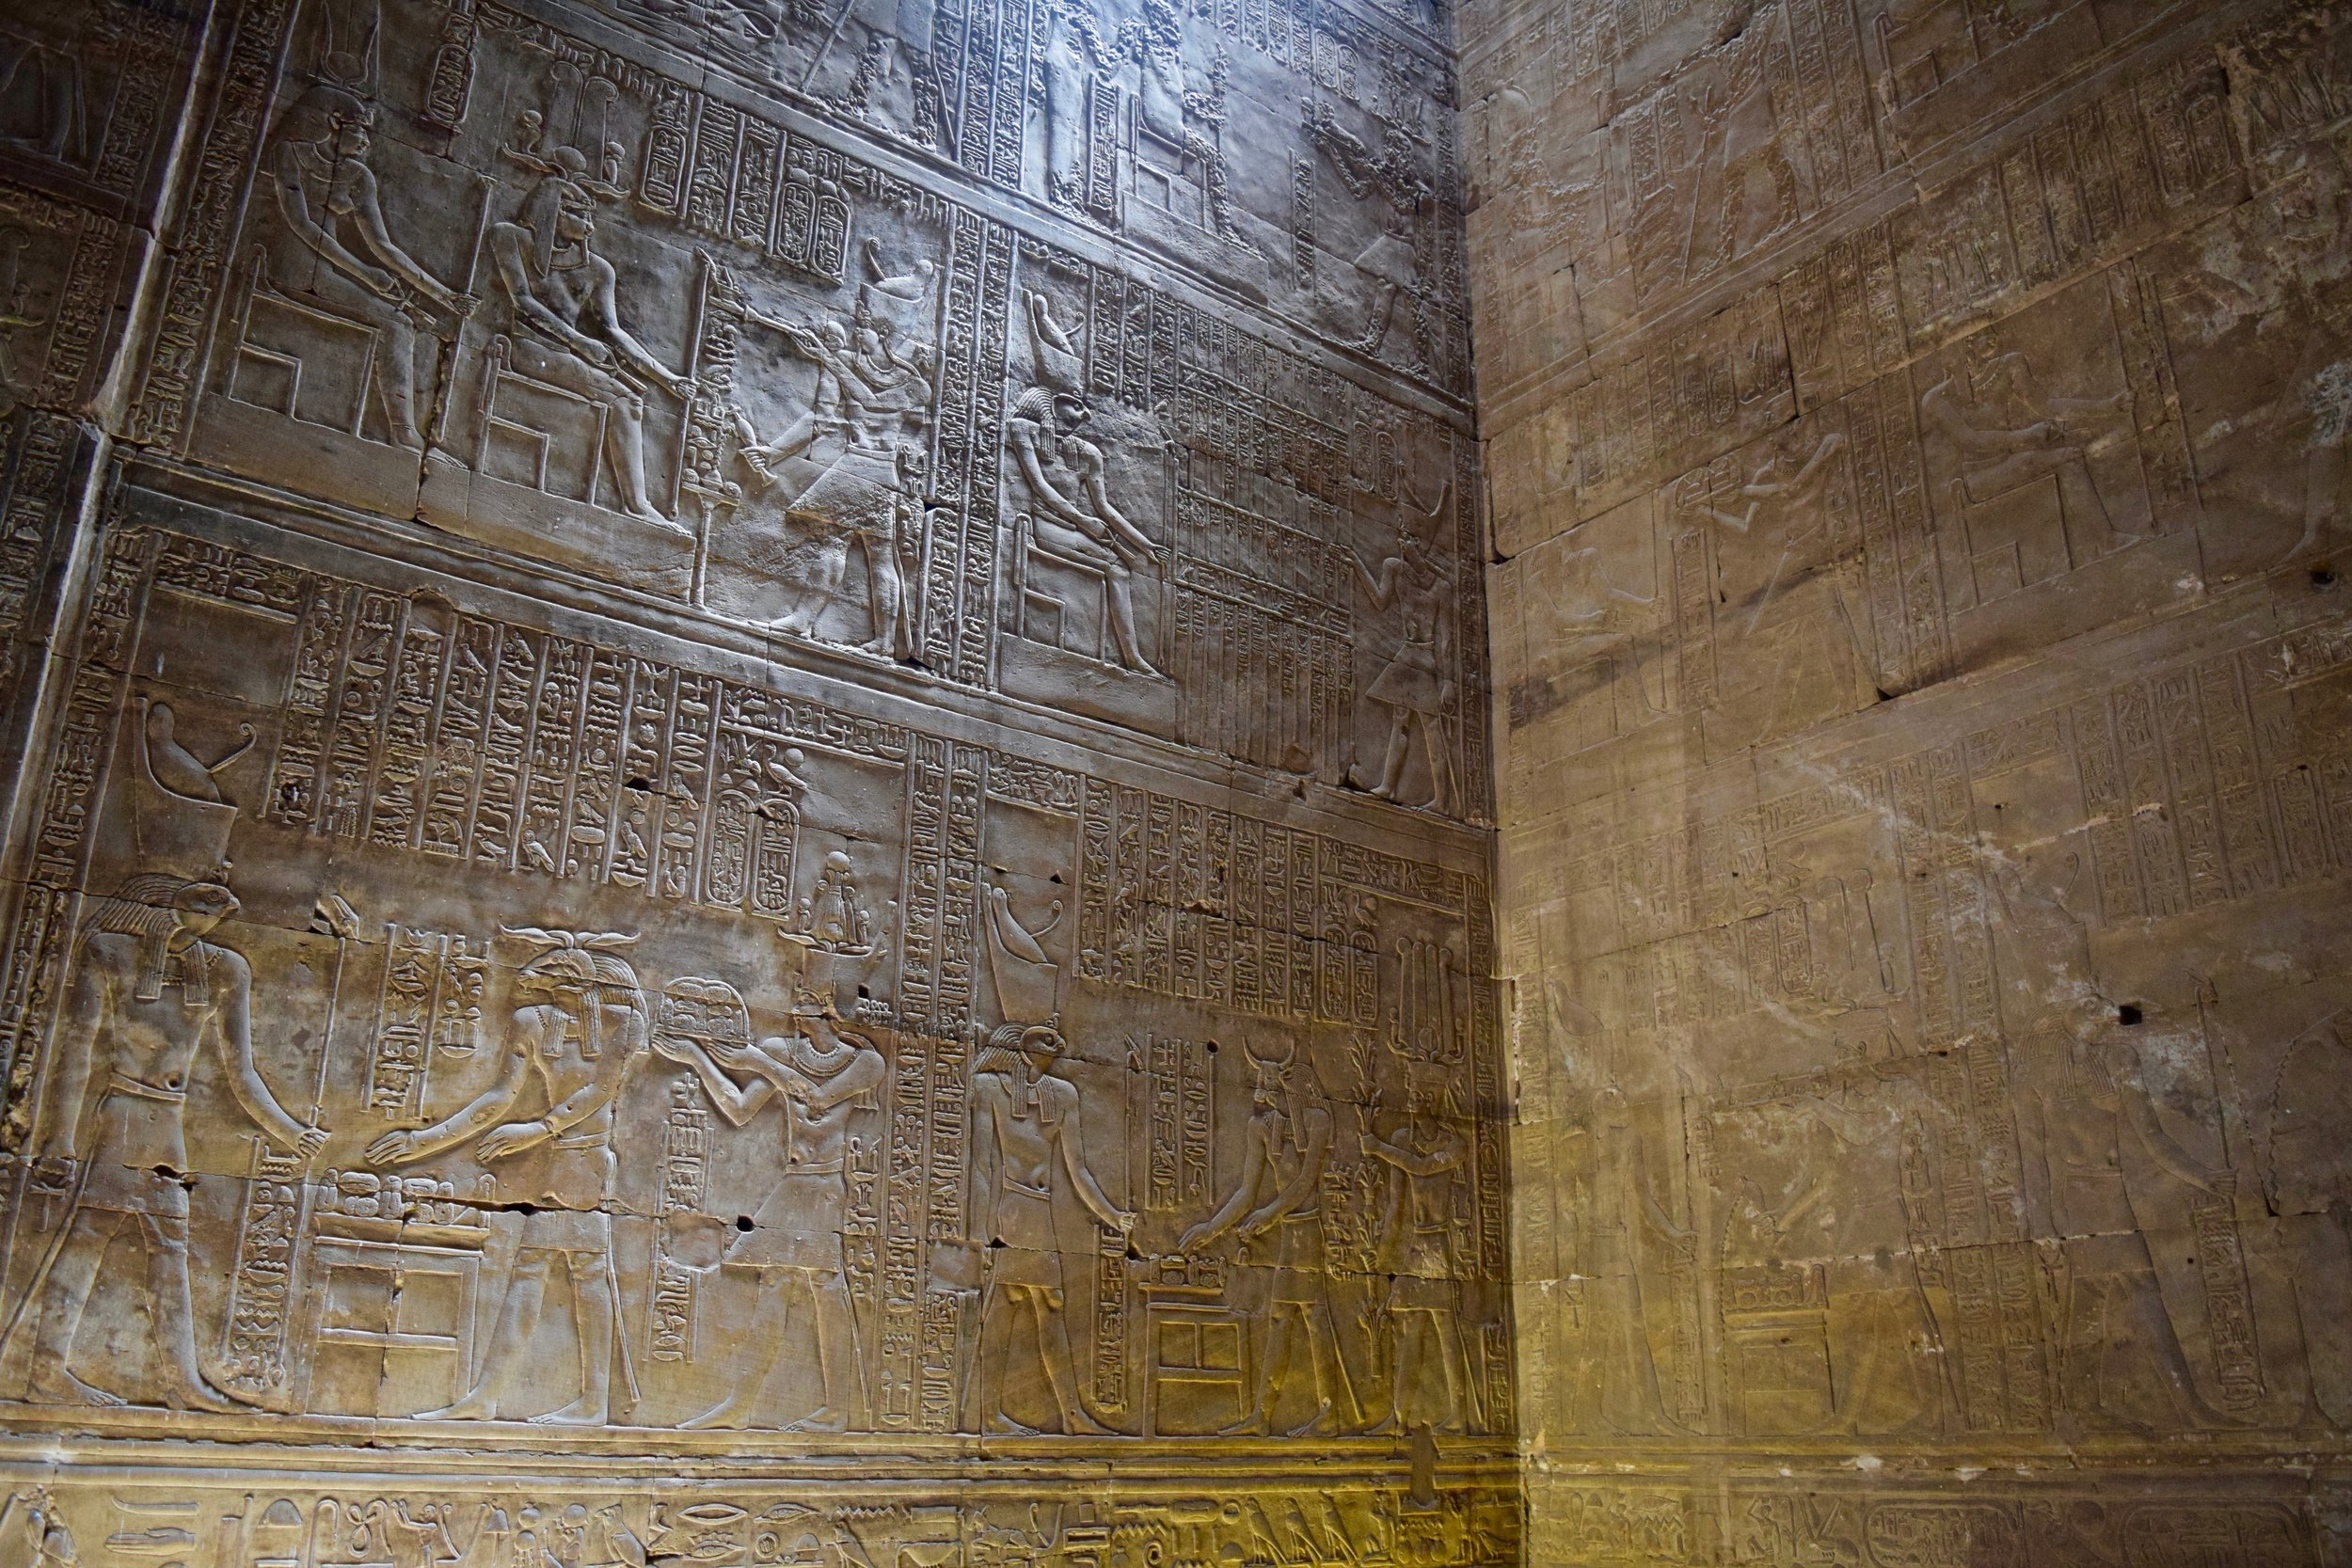 Sanctuary of God Horus